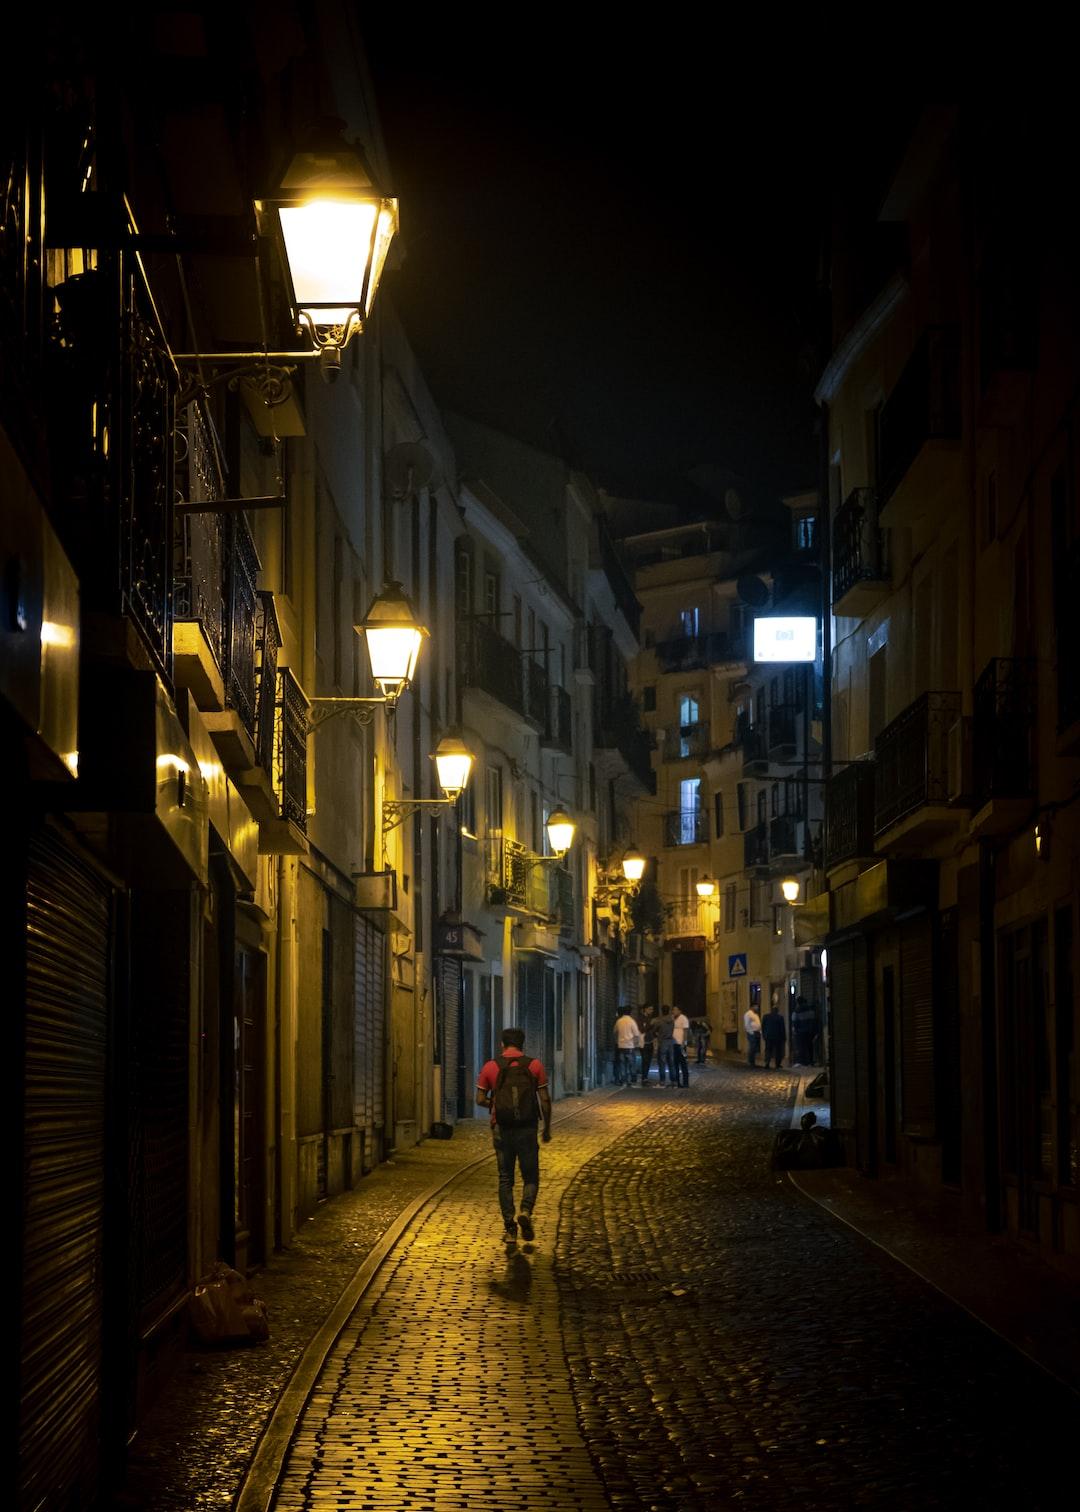 Man walking in a street in lisbon at night.